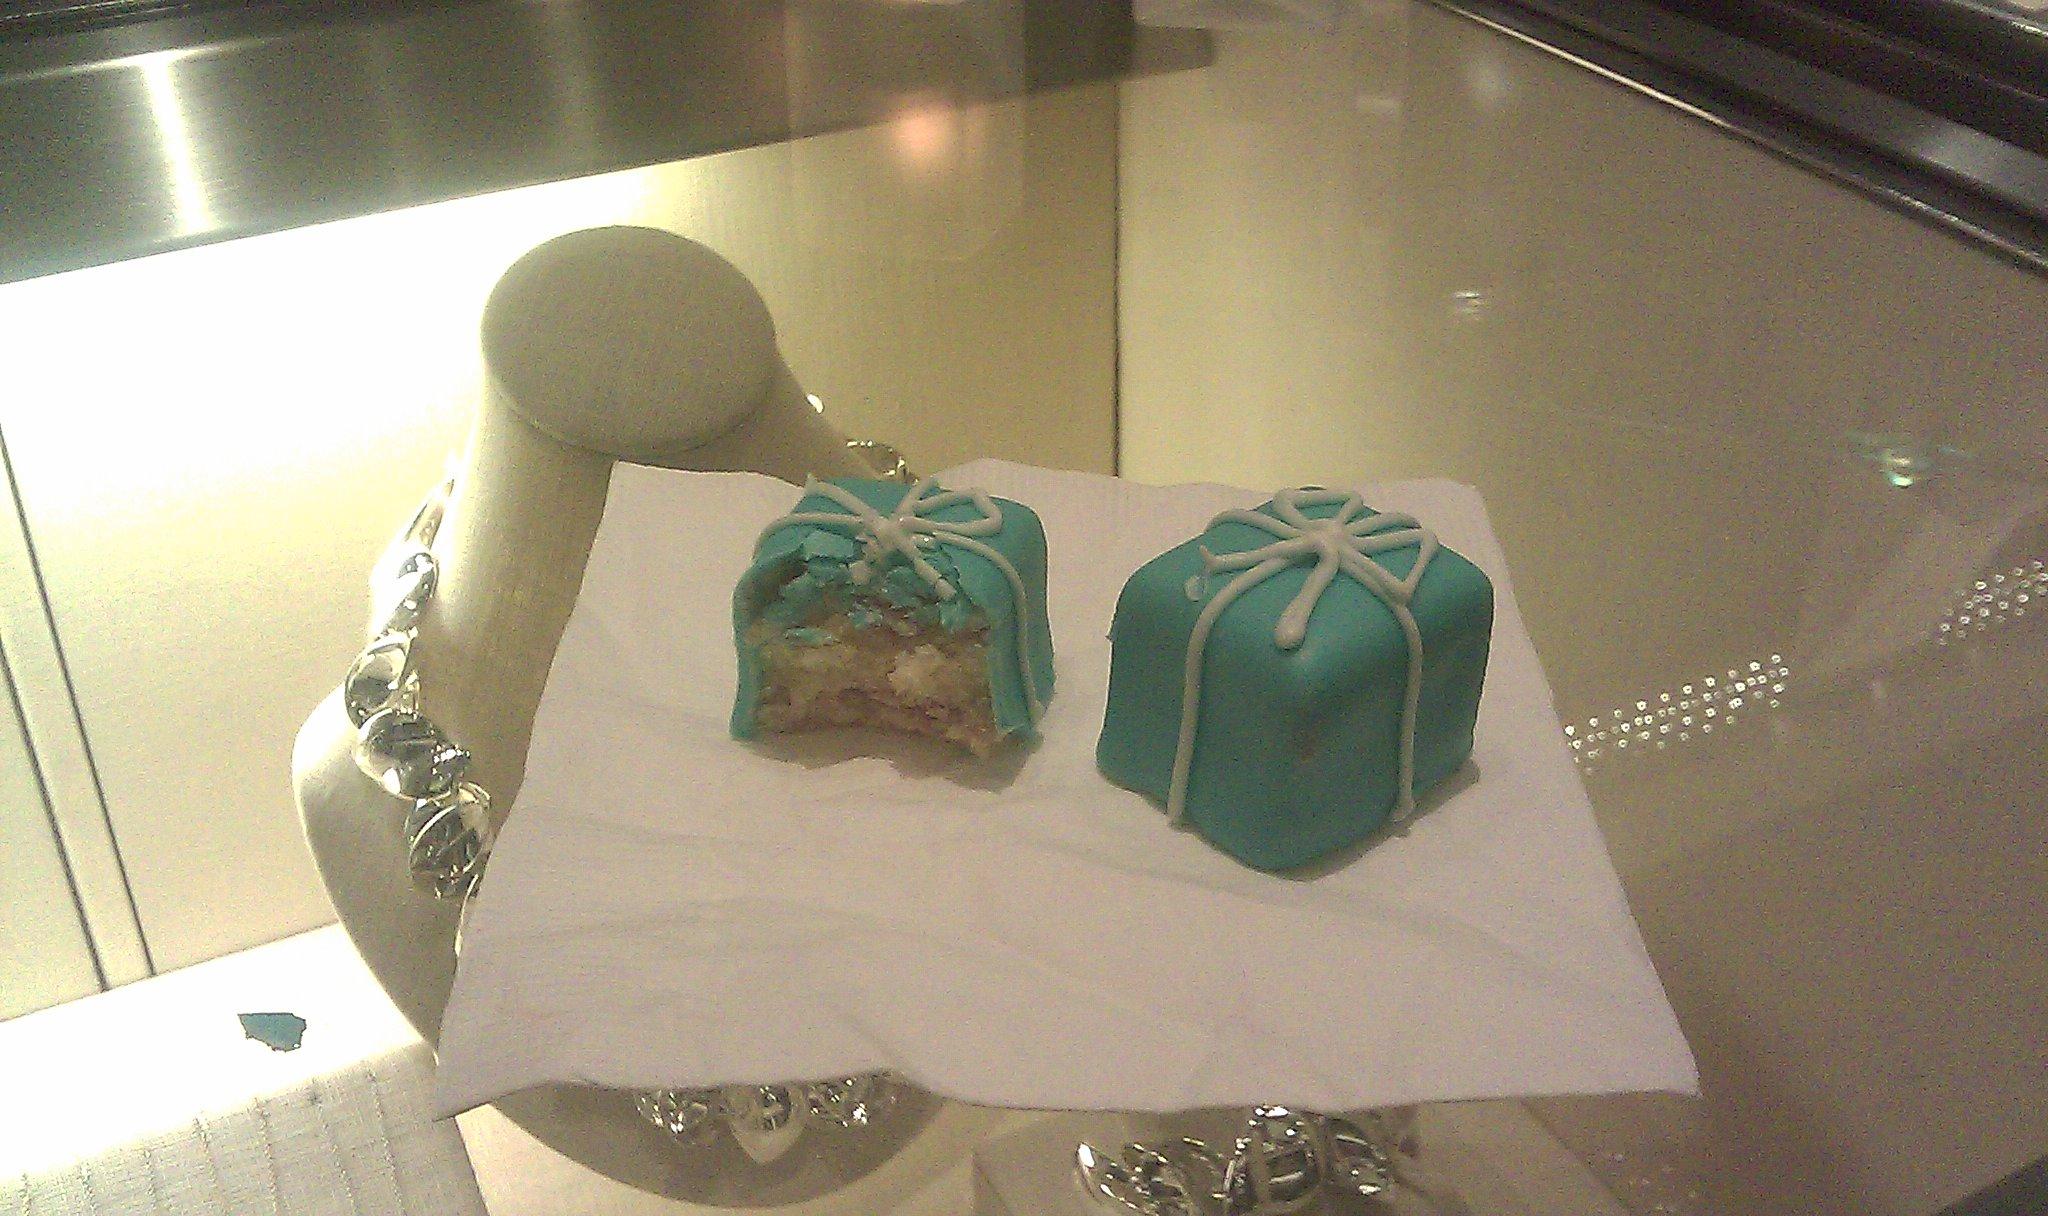 Tiffany s blue box petit fours. Tiffany   Co. desserts dab9a3a41